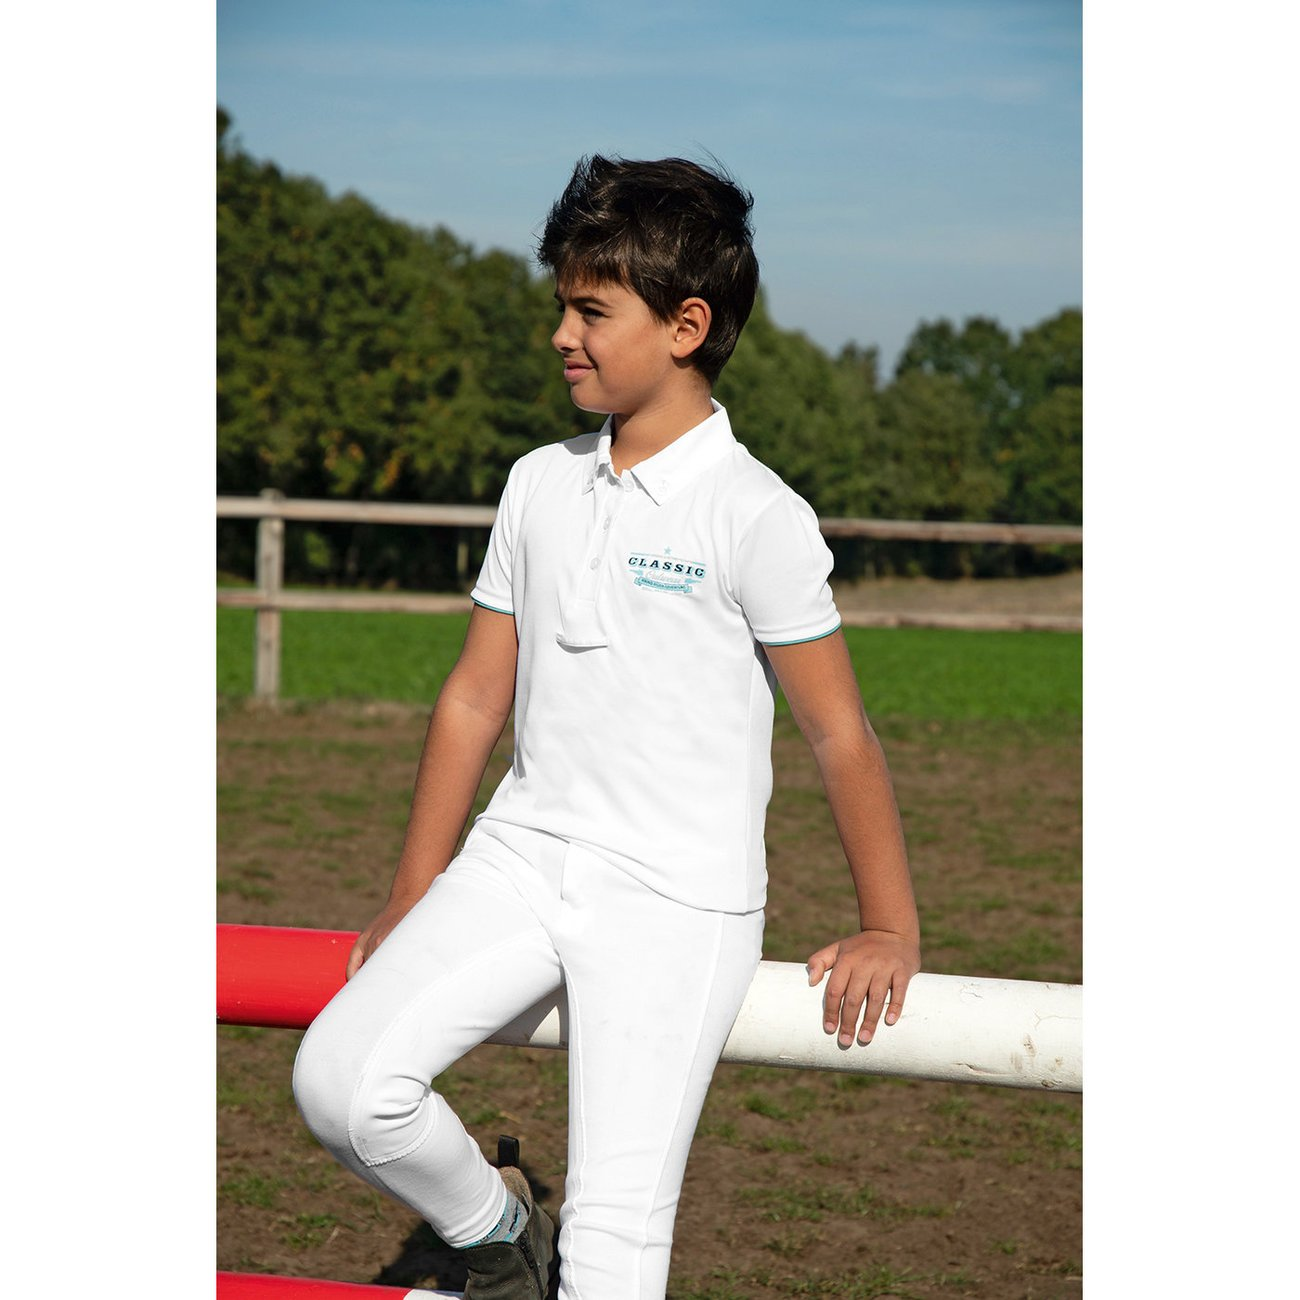 BUSSE Turnier Shirt Anton Junior Preview Image